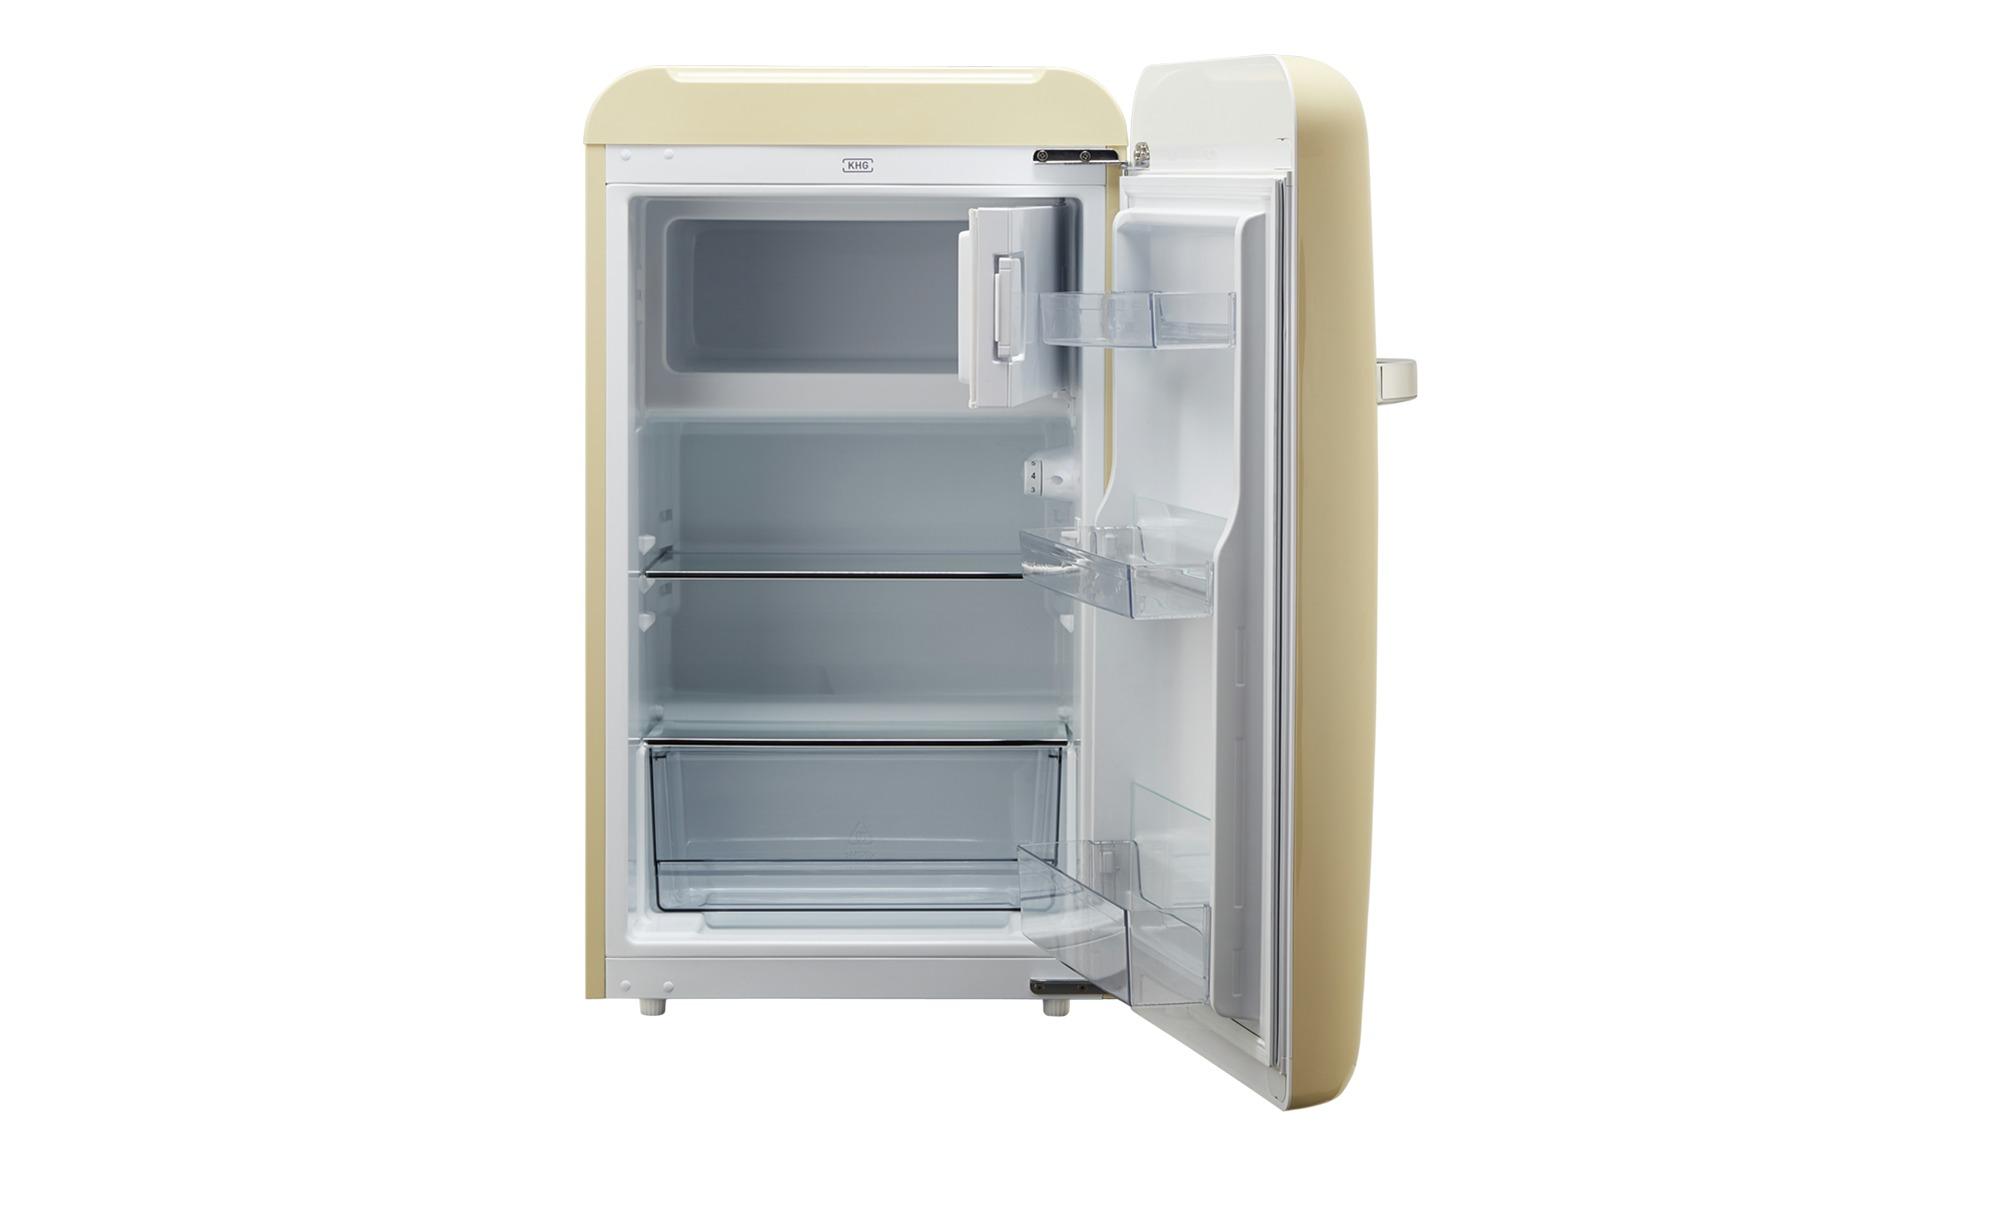 Bomann Kühlschrank Creme : Khg kühlschrank ksr mg c creme bei möbel kraft online kaufen